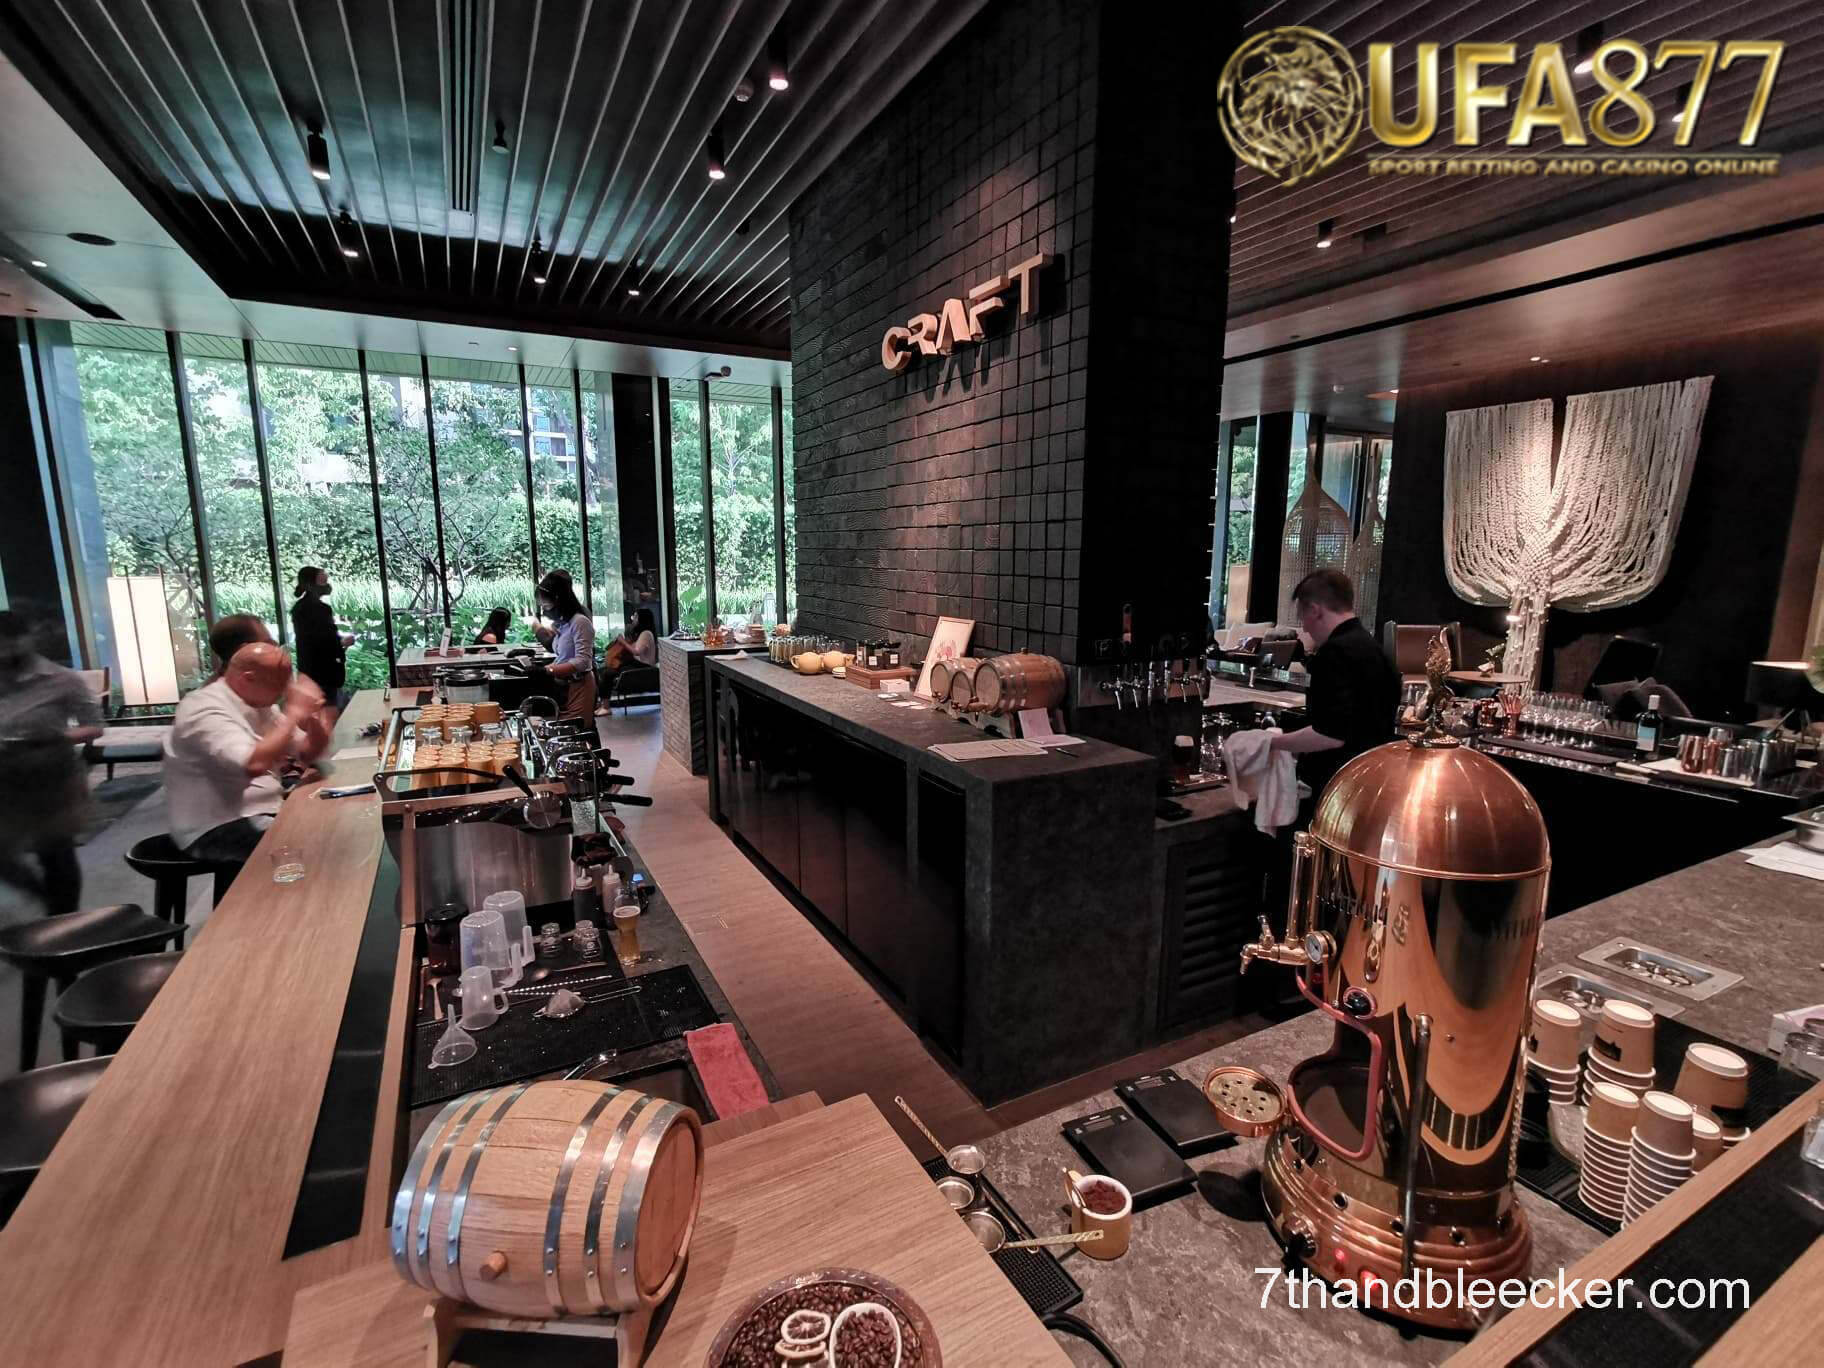 CRAFT ร้านอาหารย่านกรุงเทพ พร้อมบรรยากาศสุดเจ๋ง